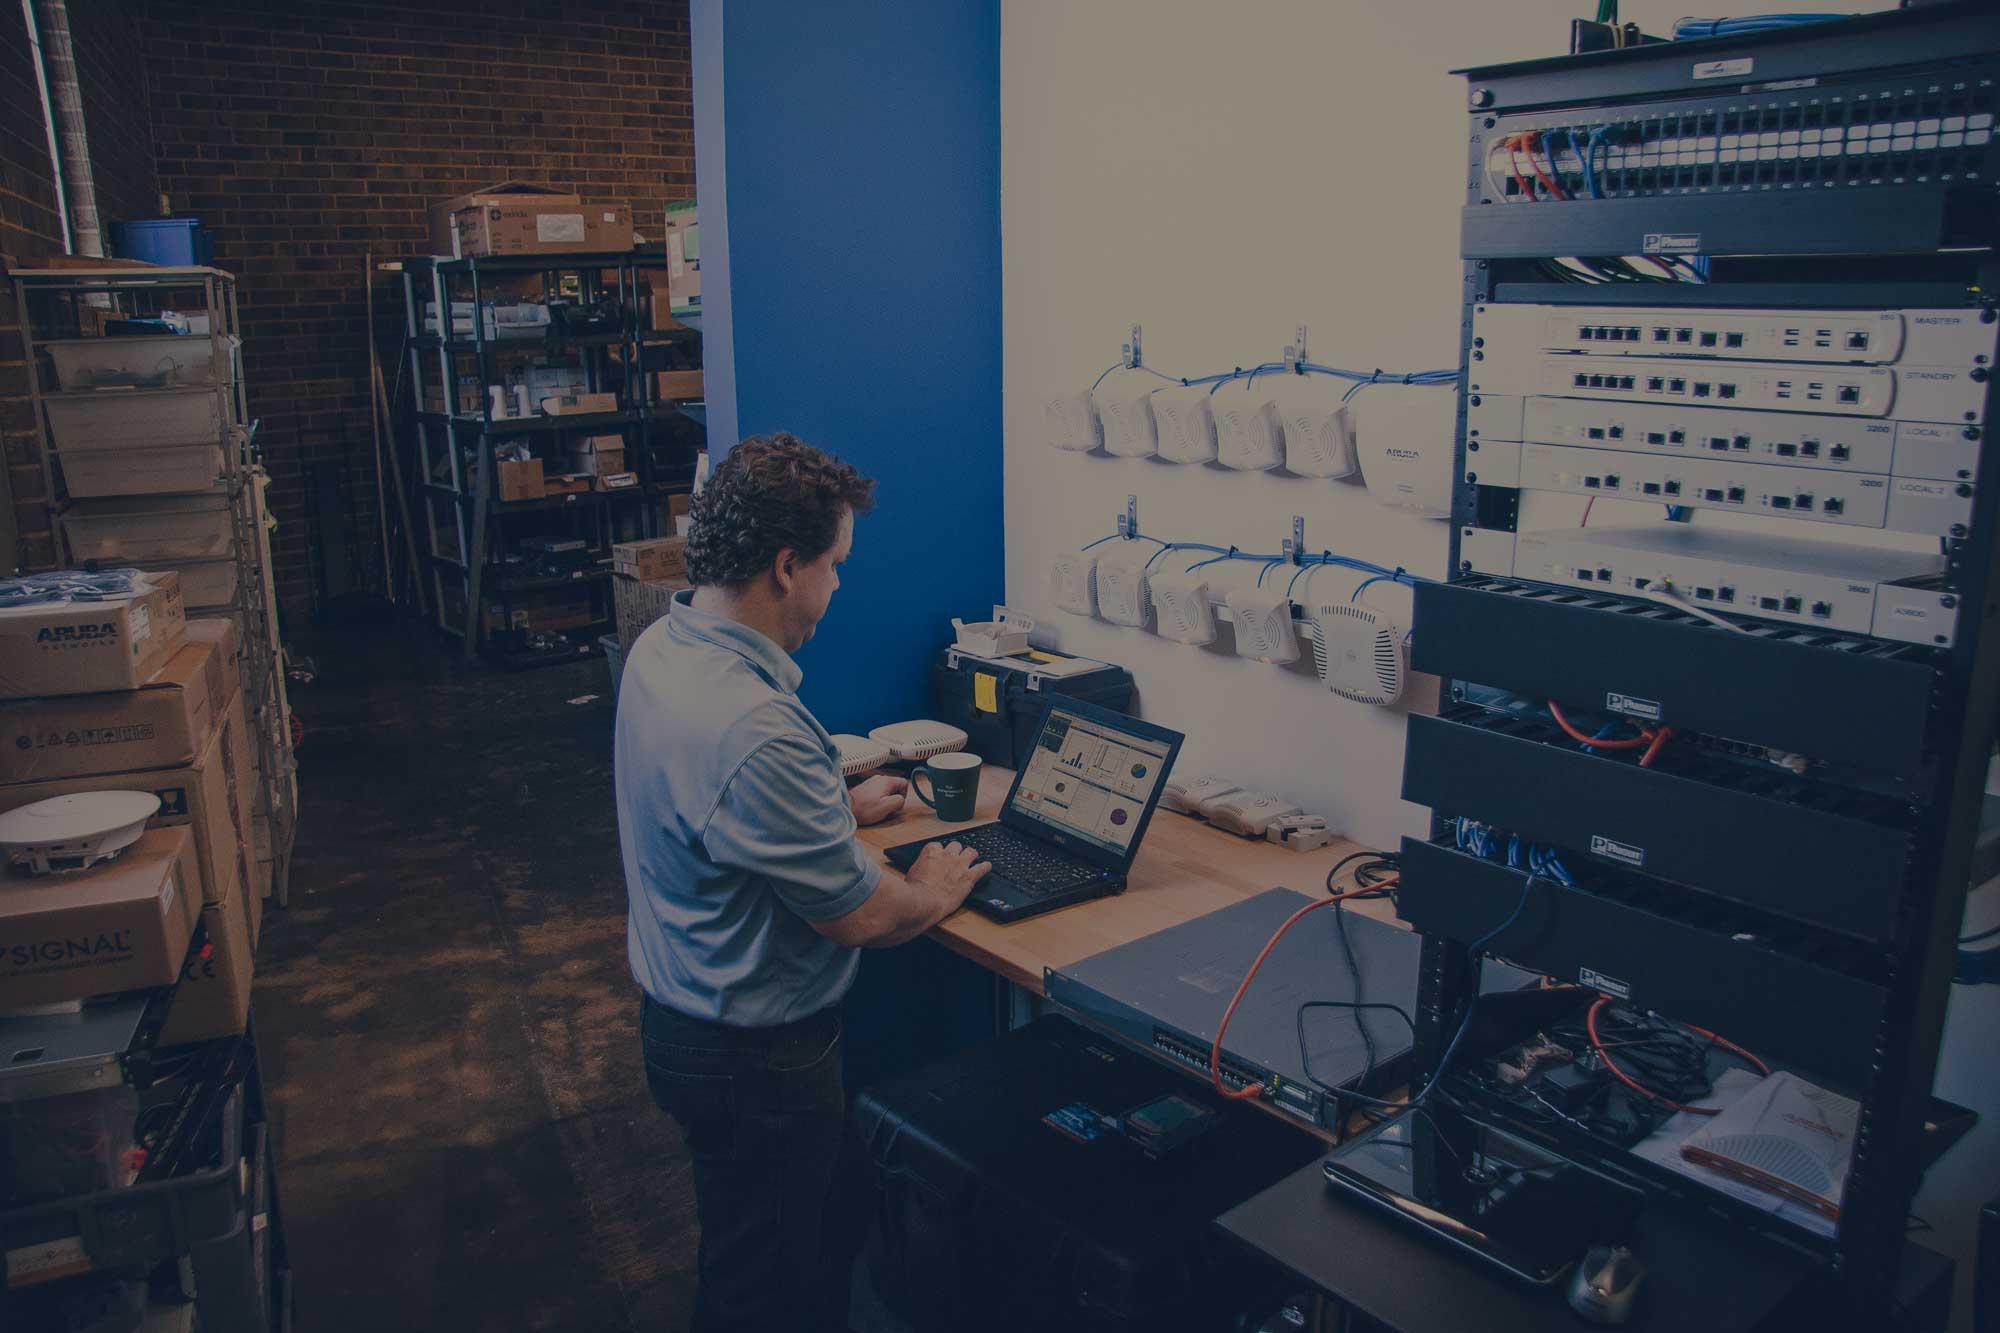 5 Reasons To Buy a Next Generation Firewall vs. Traditional Firewalls